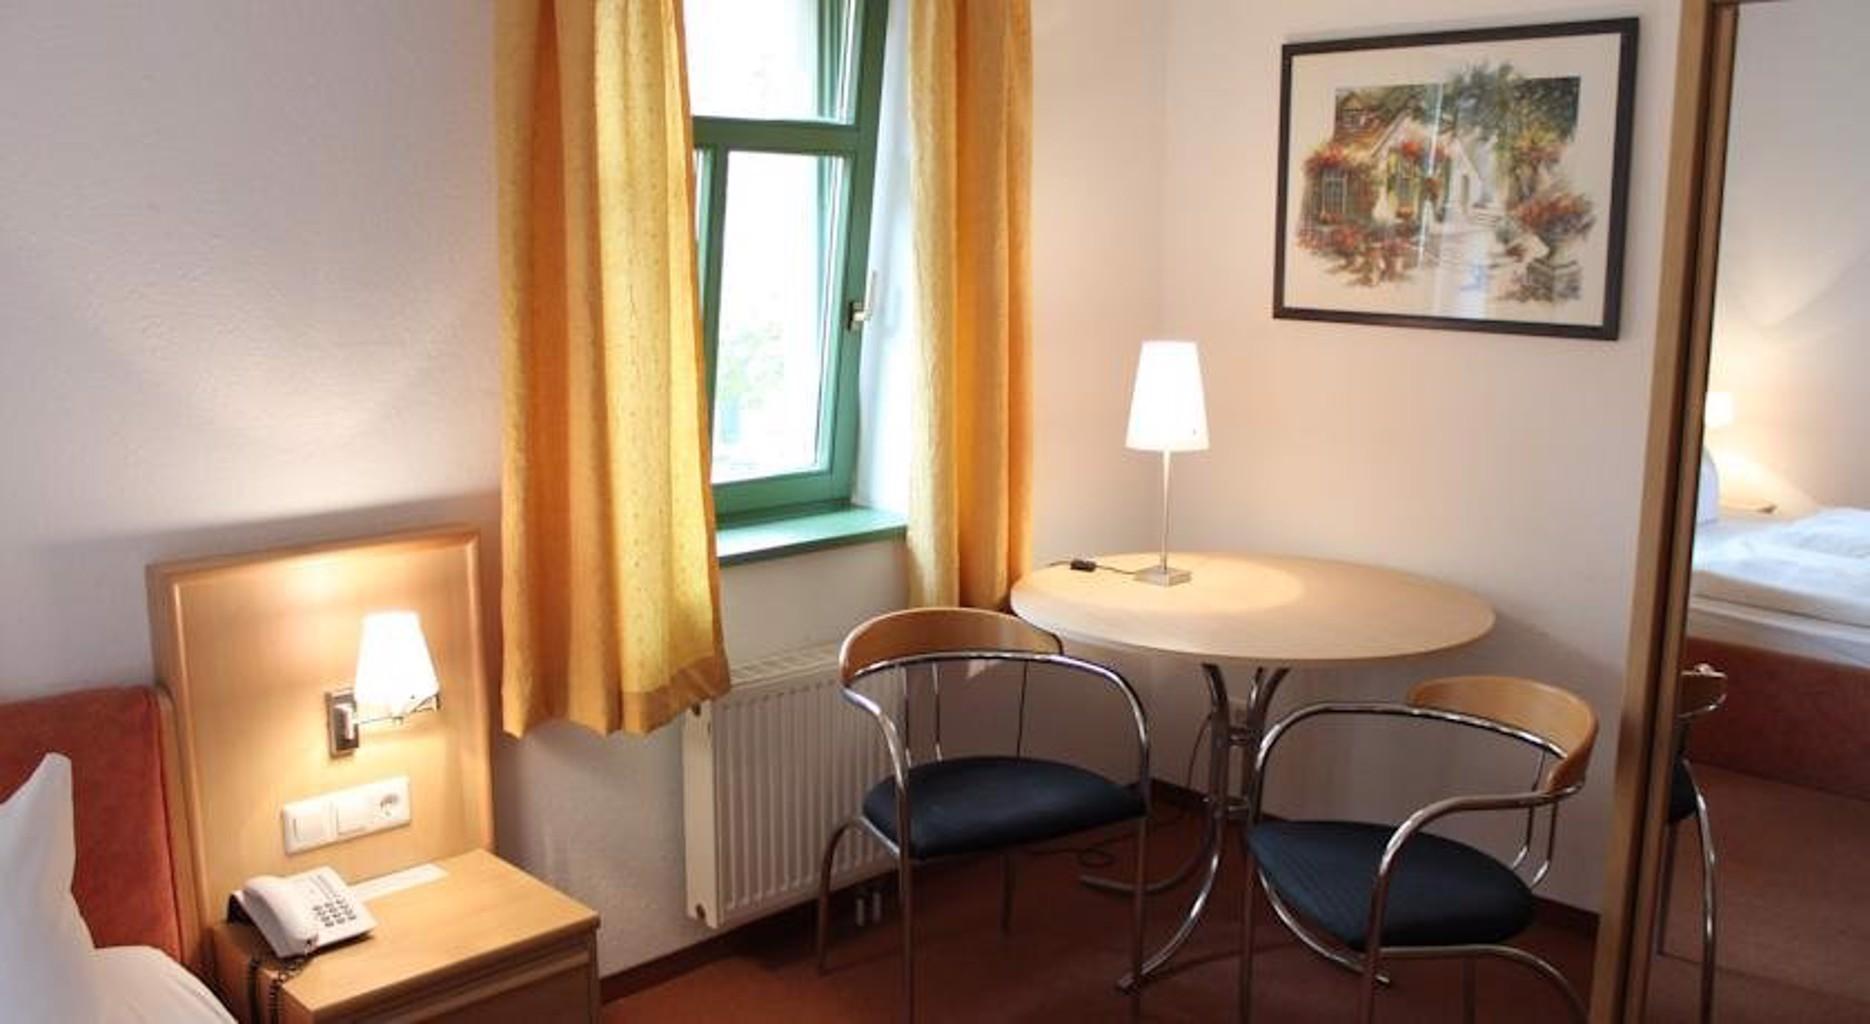 Gallery image of Gutshof Hauber